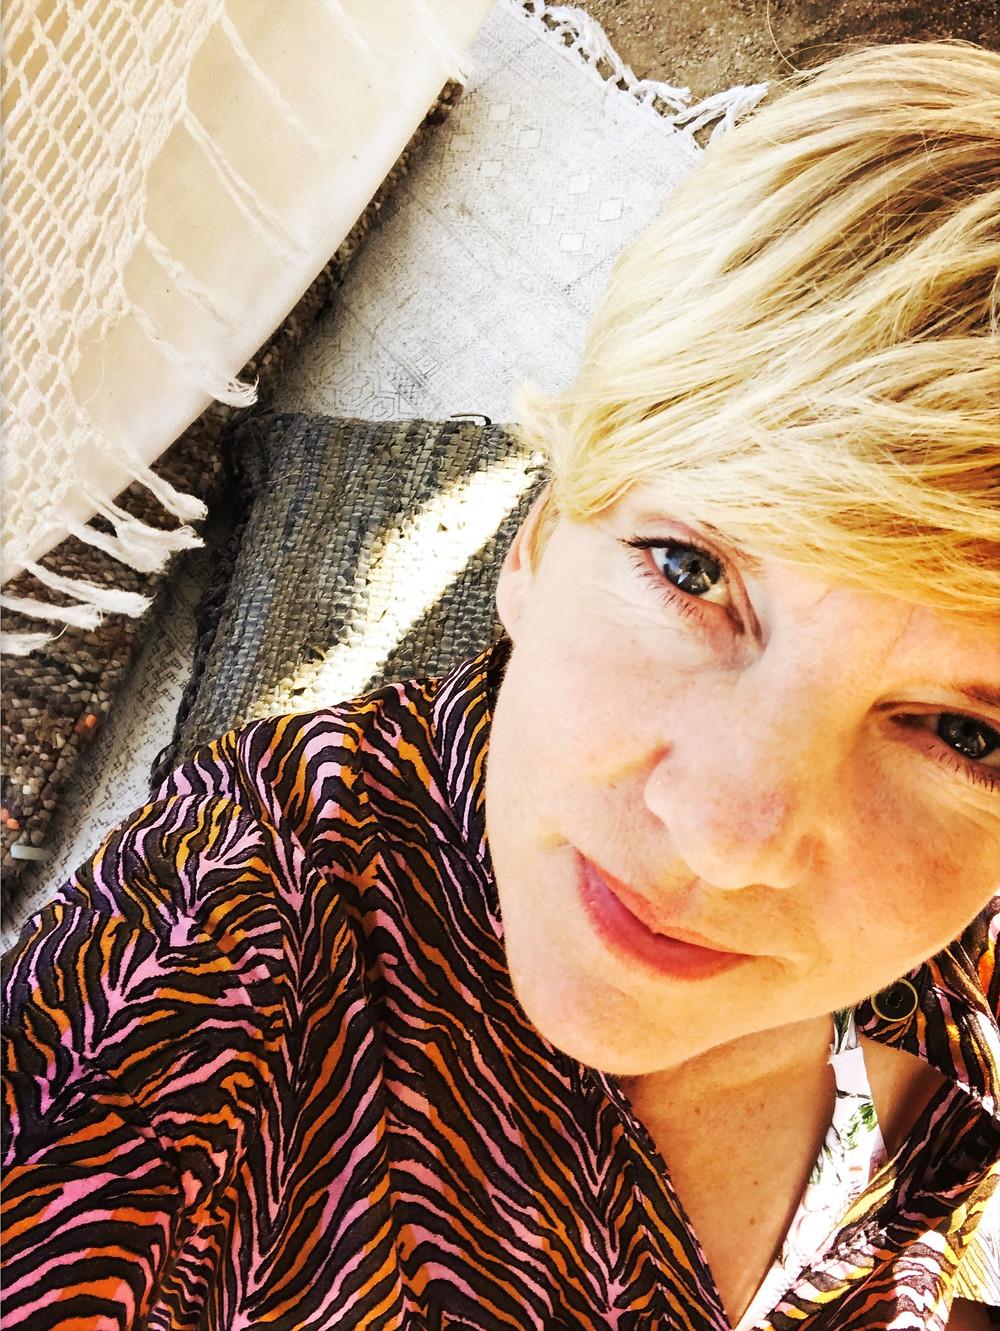 Marion Kolb, www.systemische-praxis-muenchen.de, Ayurveda, Yoga, Retreat, Istrien, 2019